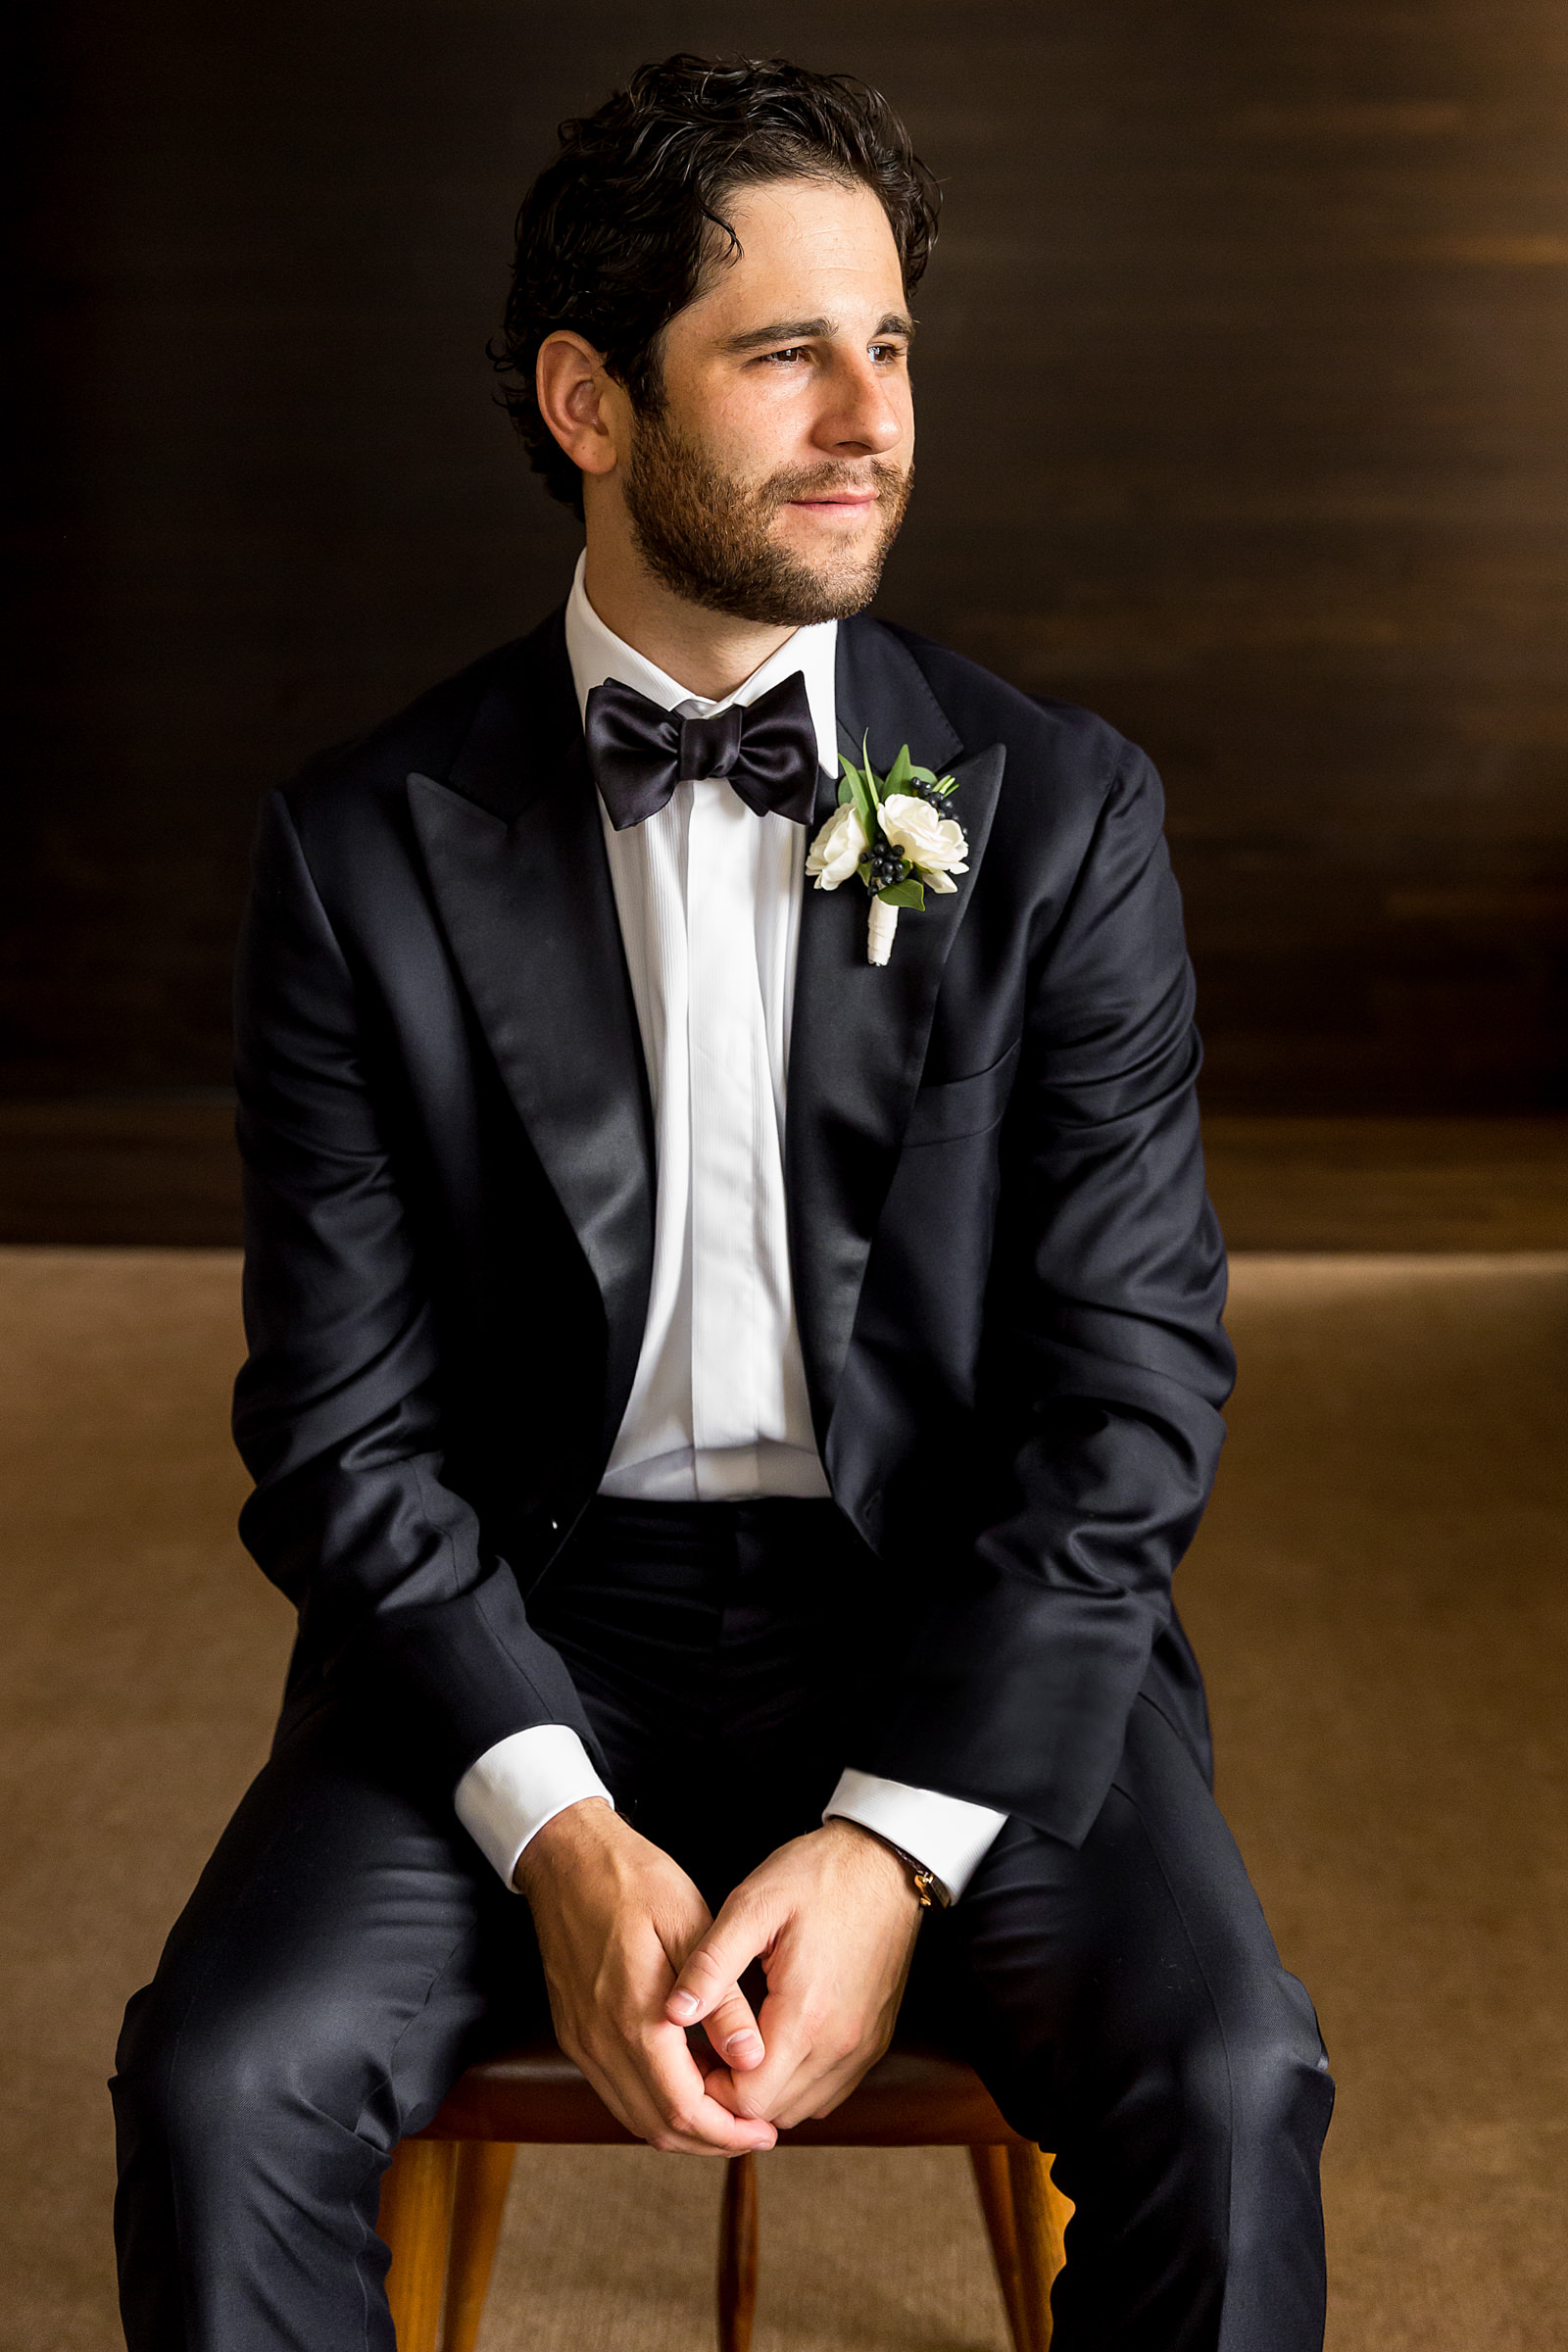 Classic groom portrait - photo by Procopio Photography